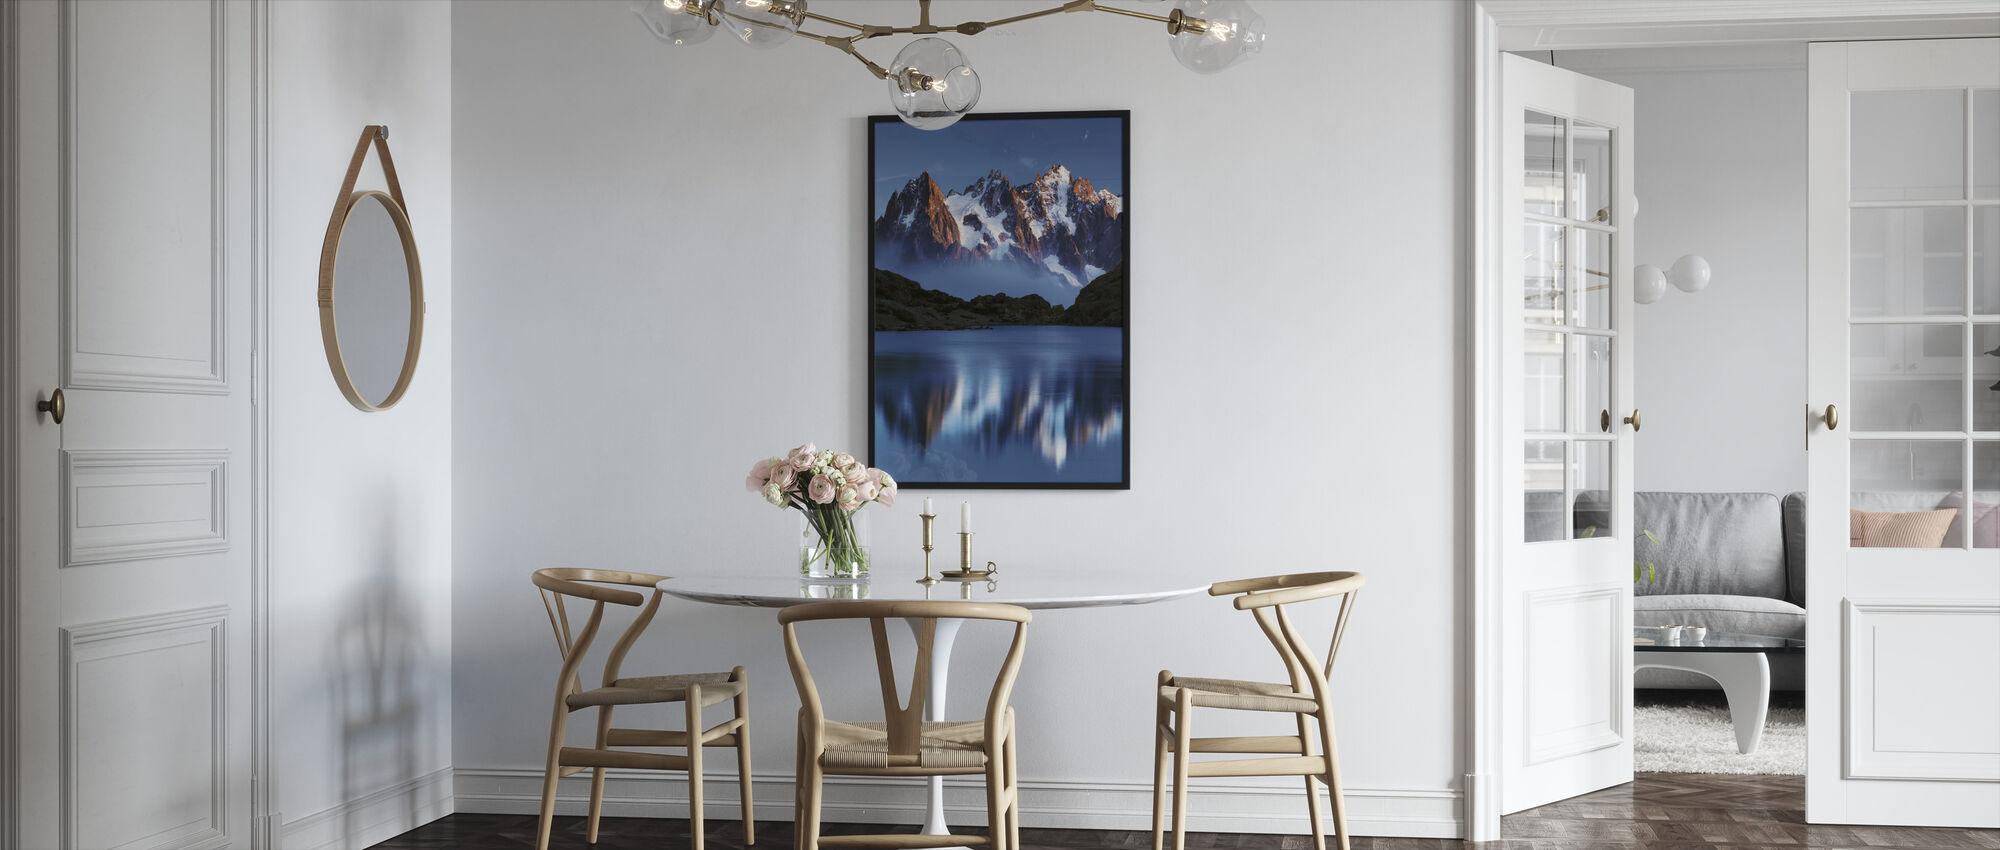 Blue Mountain Mirror - Framed print - Kitchen